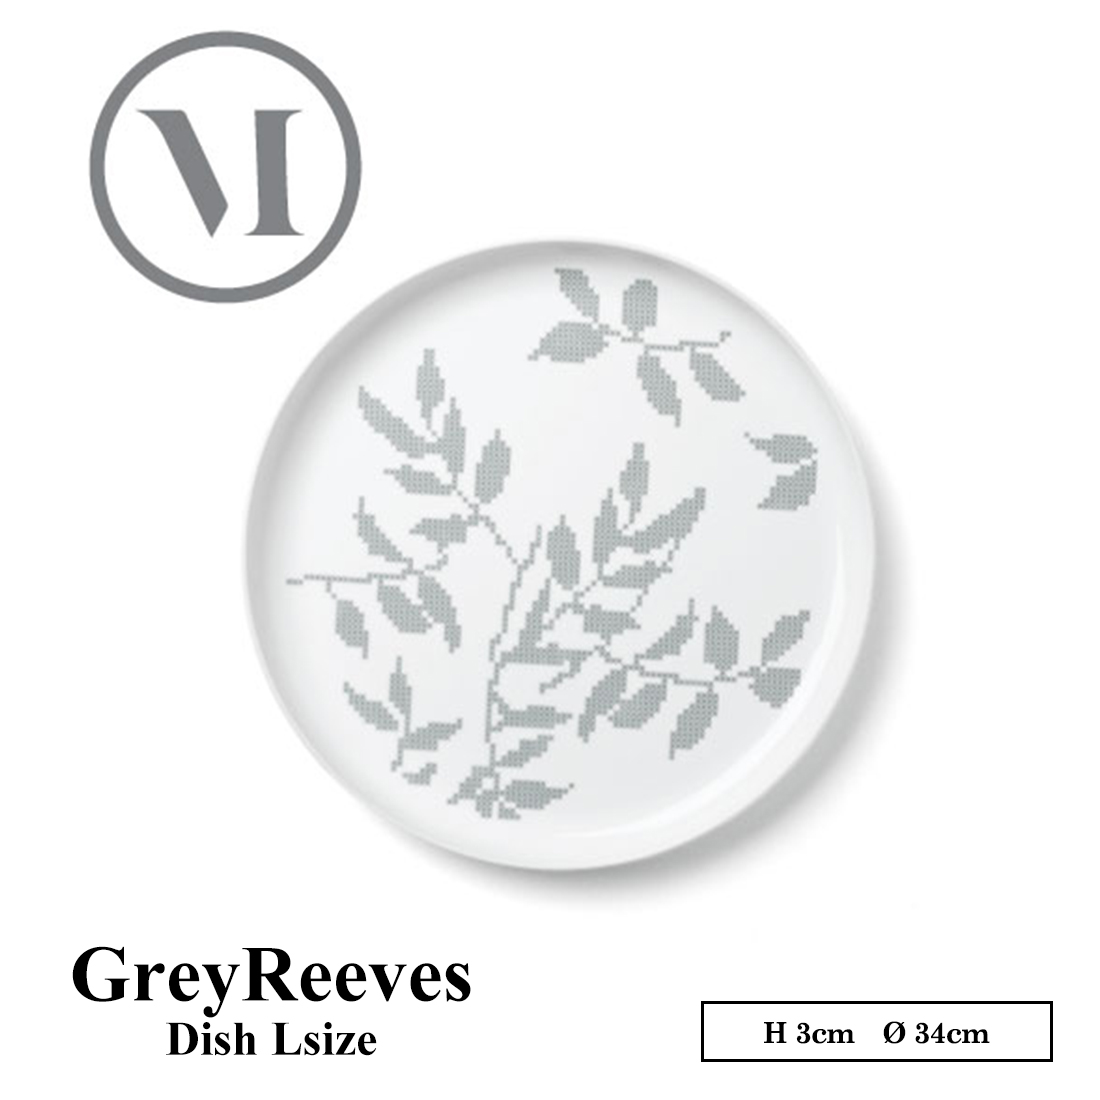 【menu】グレイリーブス 4595050 ディッシュLサイズ MENU Dish 4595050 MENU Dish 丸皿【コンビニ受取対応商品】【母の日】, ガーデン ストーリー:0f518417 --- m2cweb.com